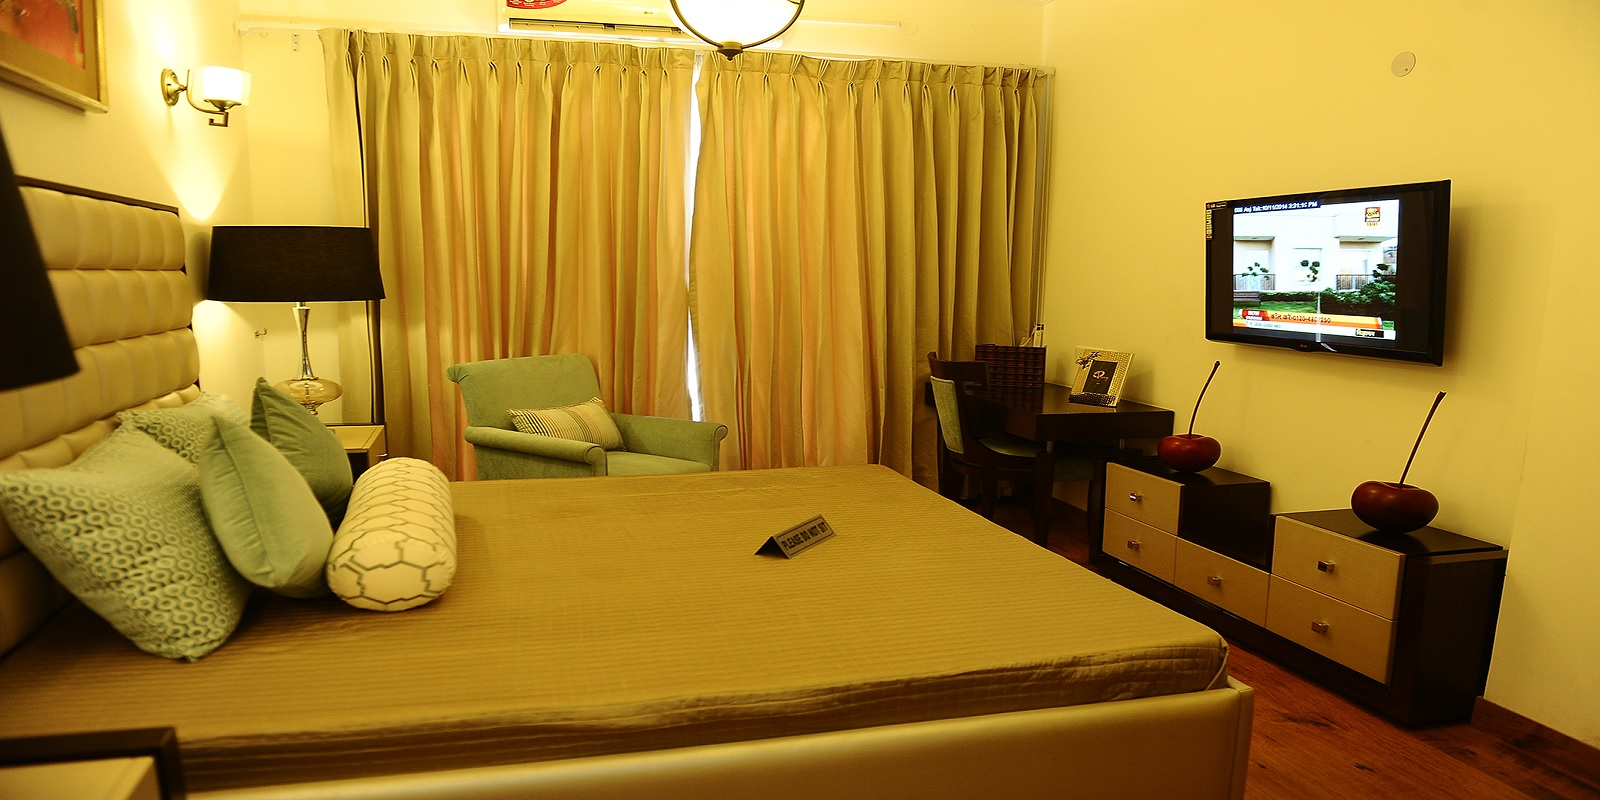 radhey krishna casa green i apartment interiors11